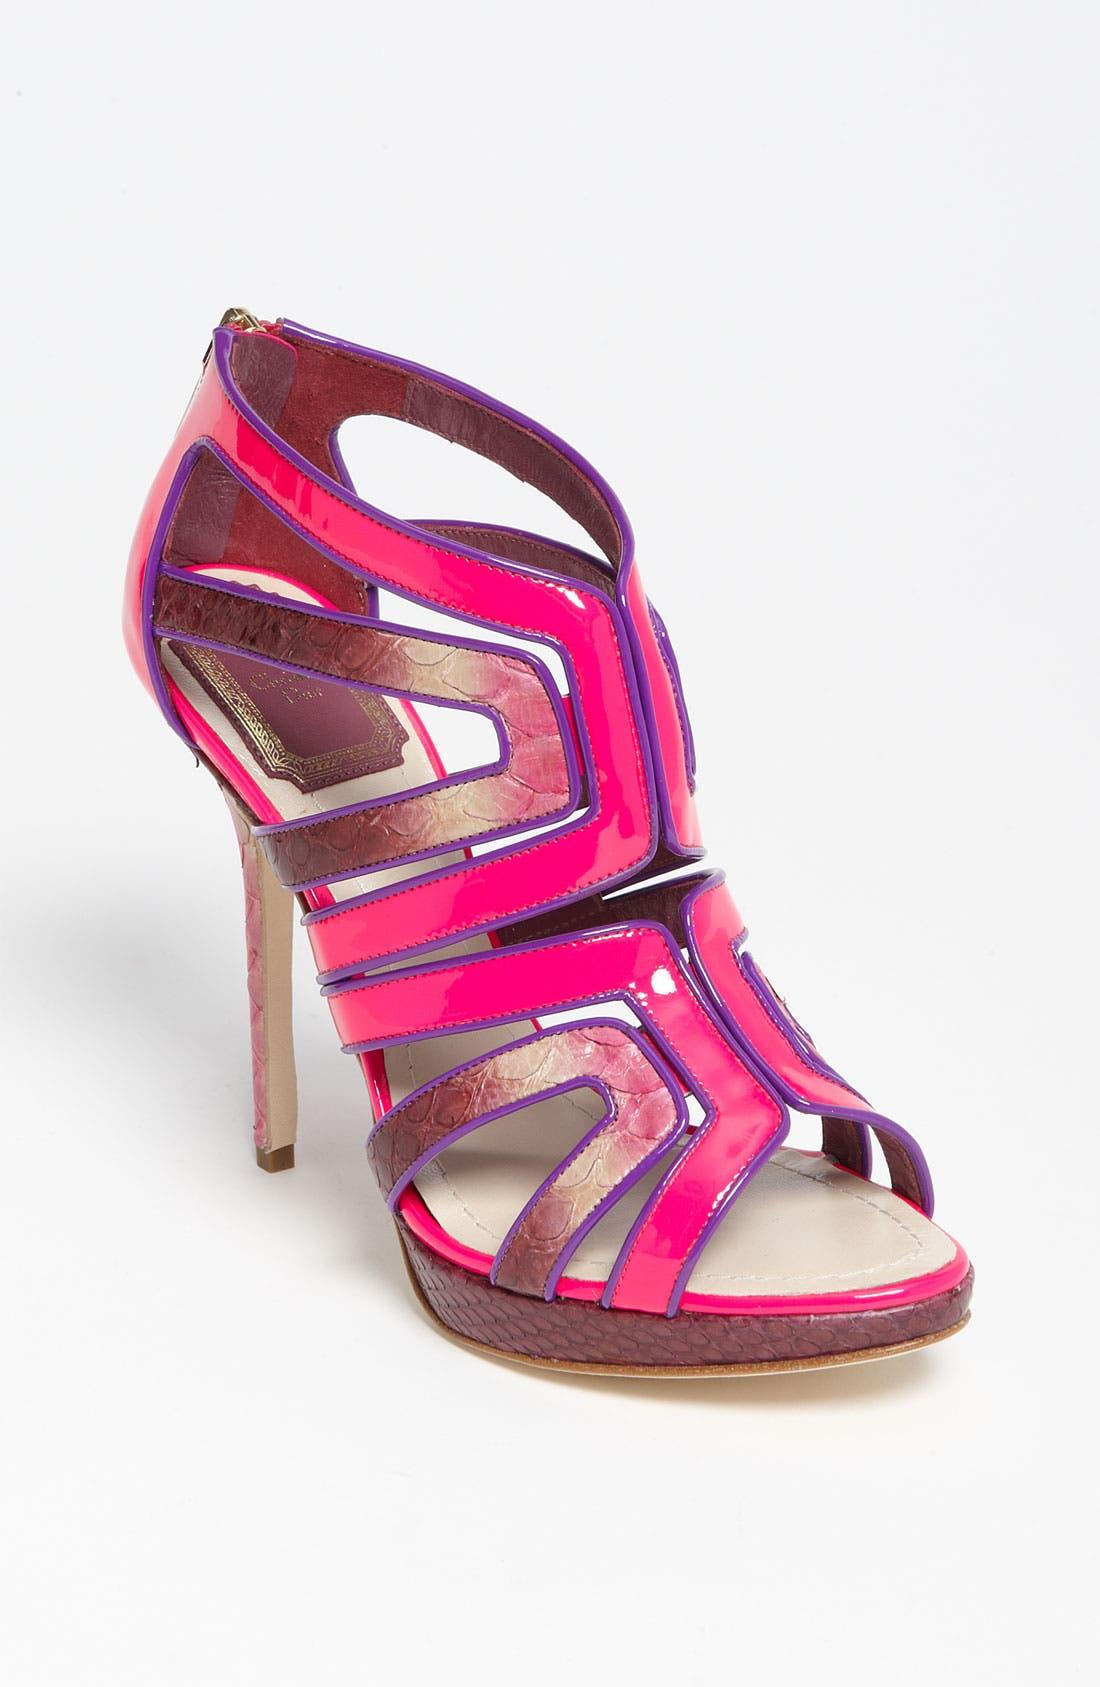 Alternate Image 1 Selected - Dior 'Intense' Genuine Python Sandal